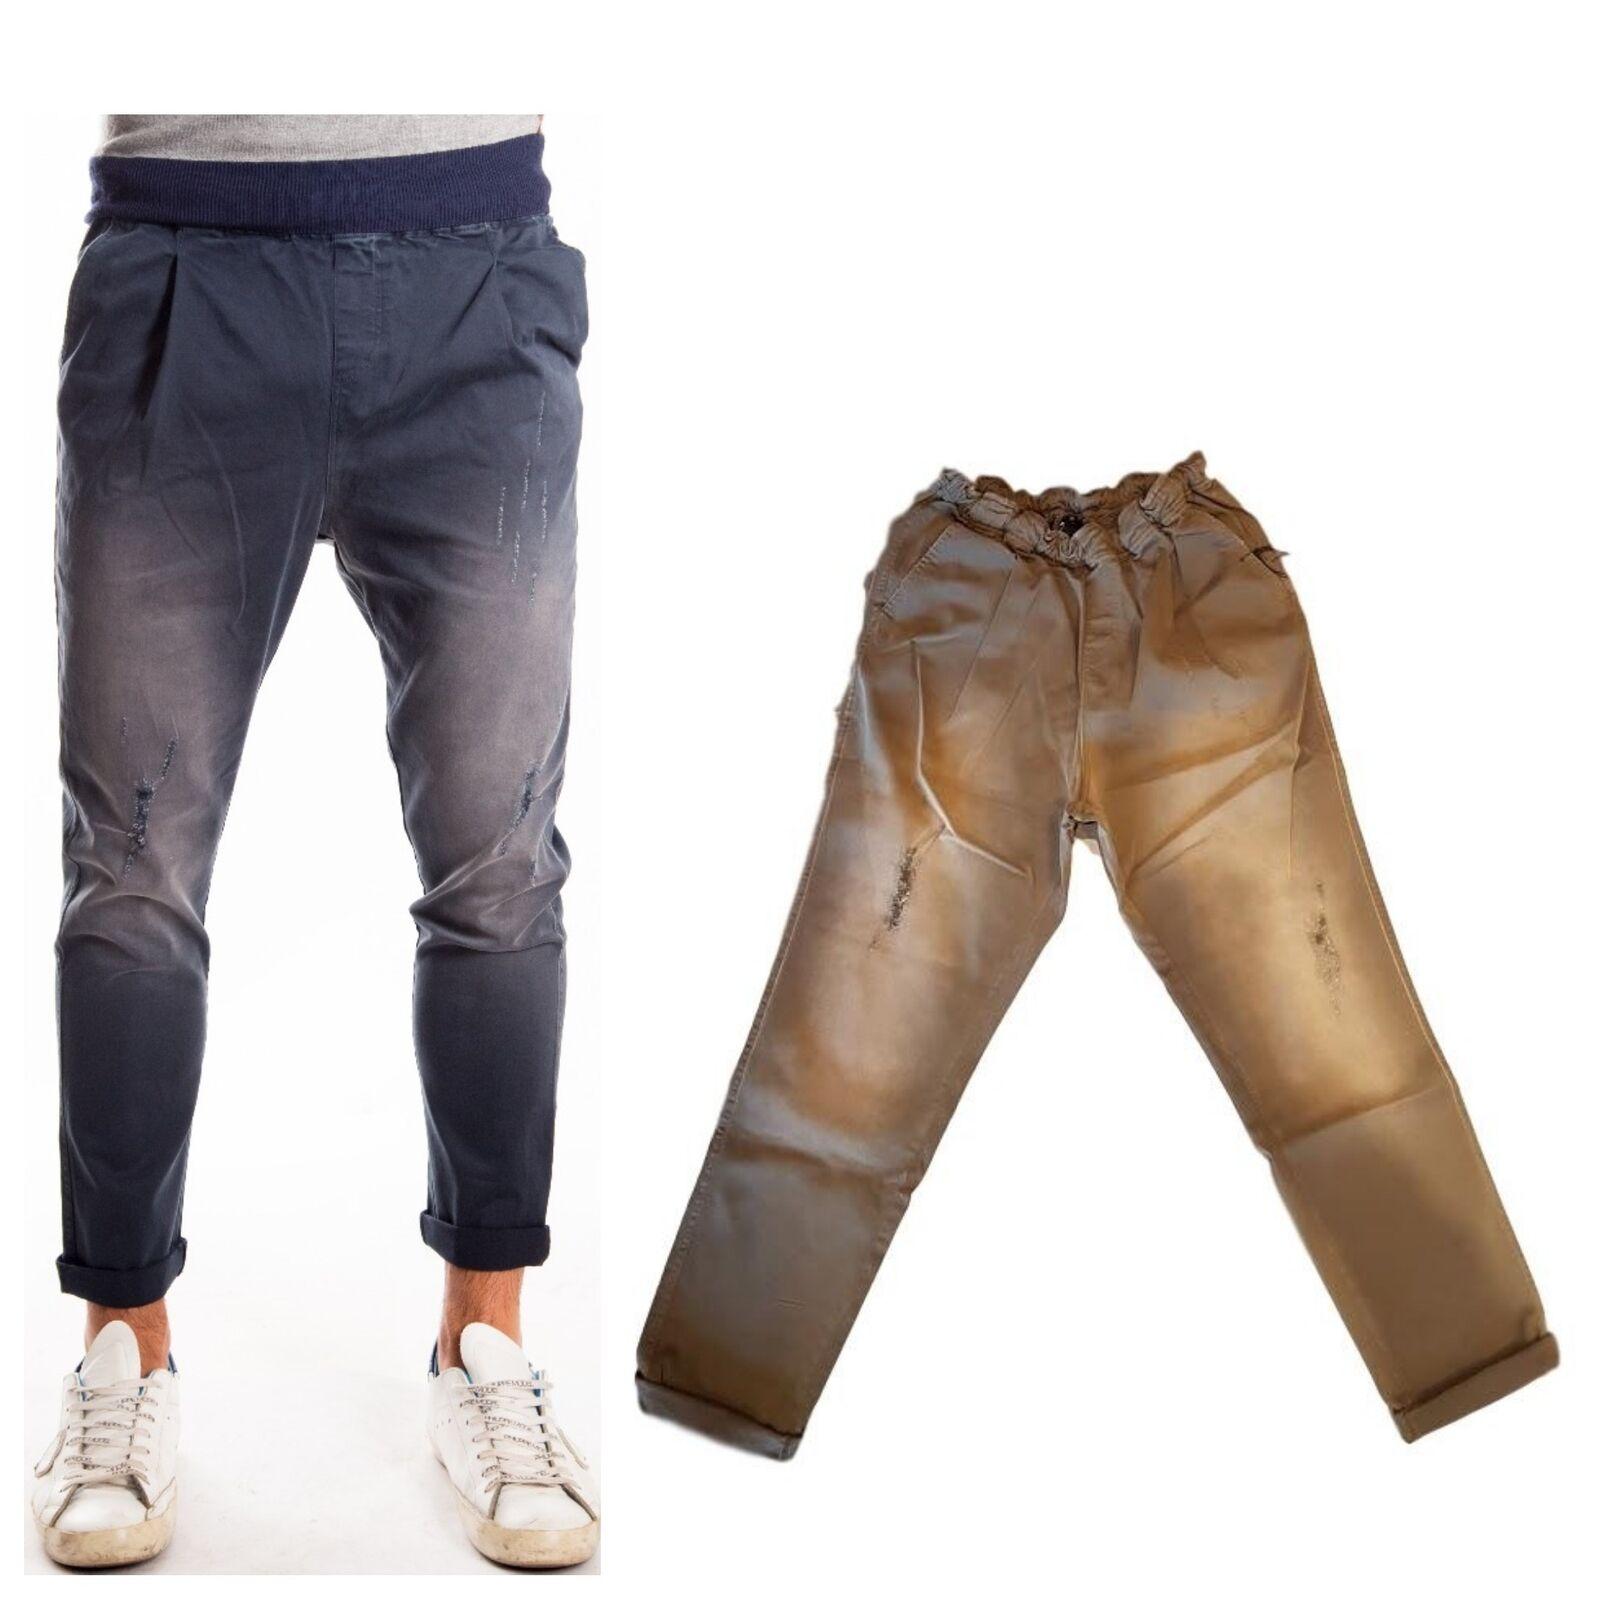 Pantaloni The Kingless Collective men 03 MIL Cavallo Basso Careda MollaPences